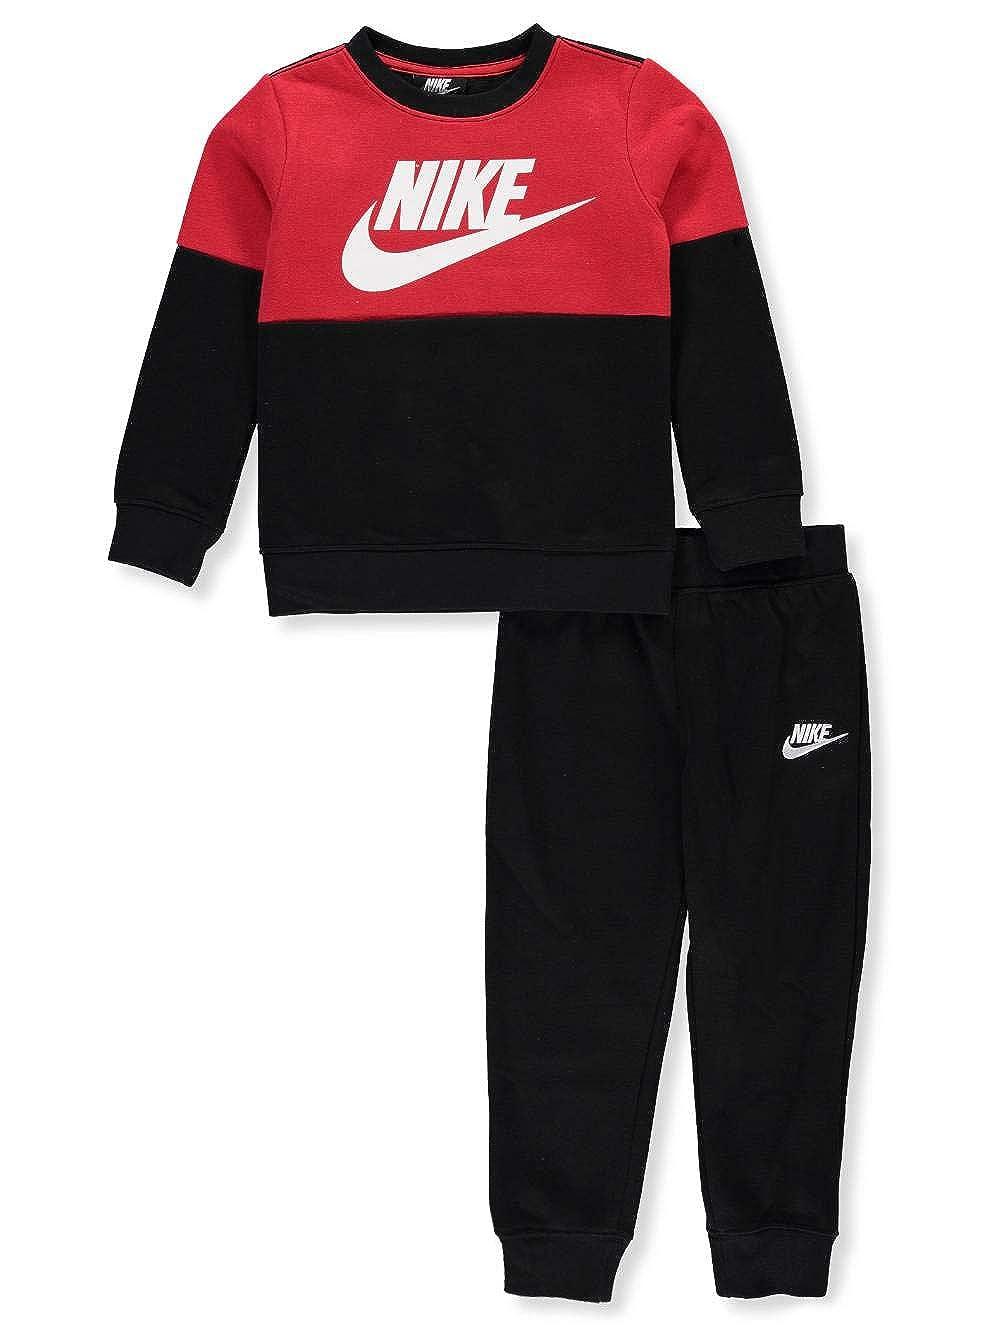 6c3f036dfa Amazon.com: Nike Boys' 2-Piece Sweatsuit Pants Set - Black, 3t: Clothing